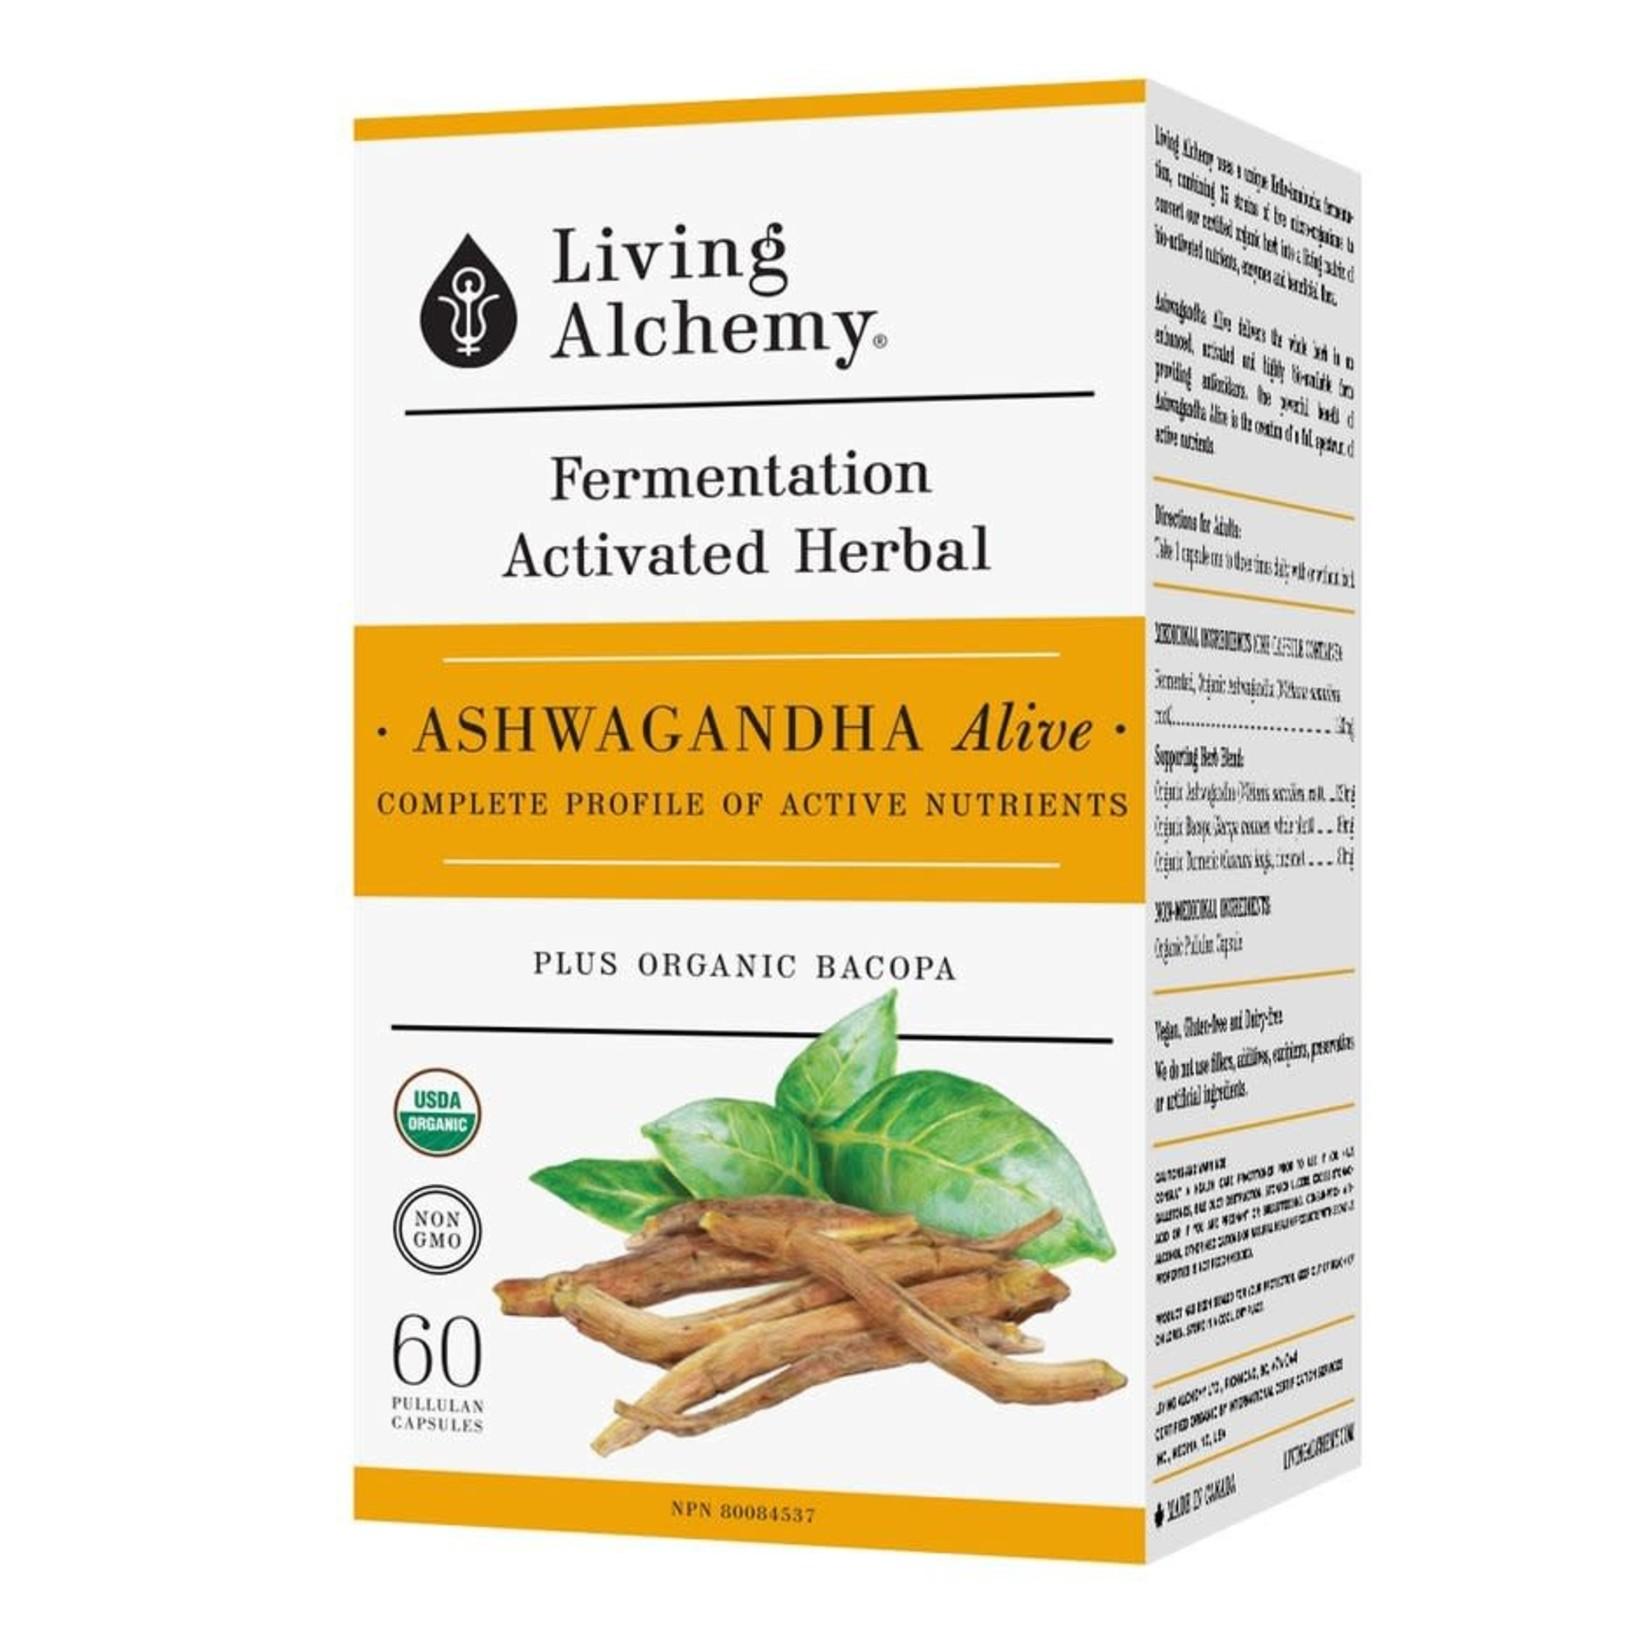 Living Alchemy Living Alchemy Ashwagandha 60 caps